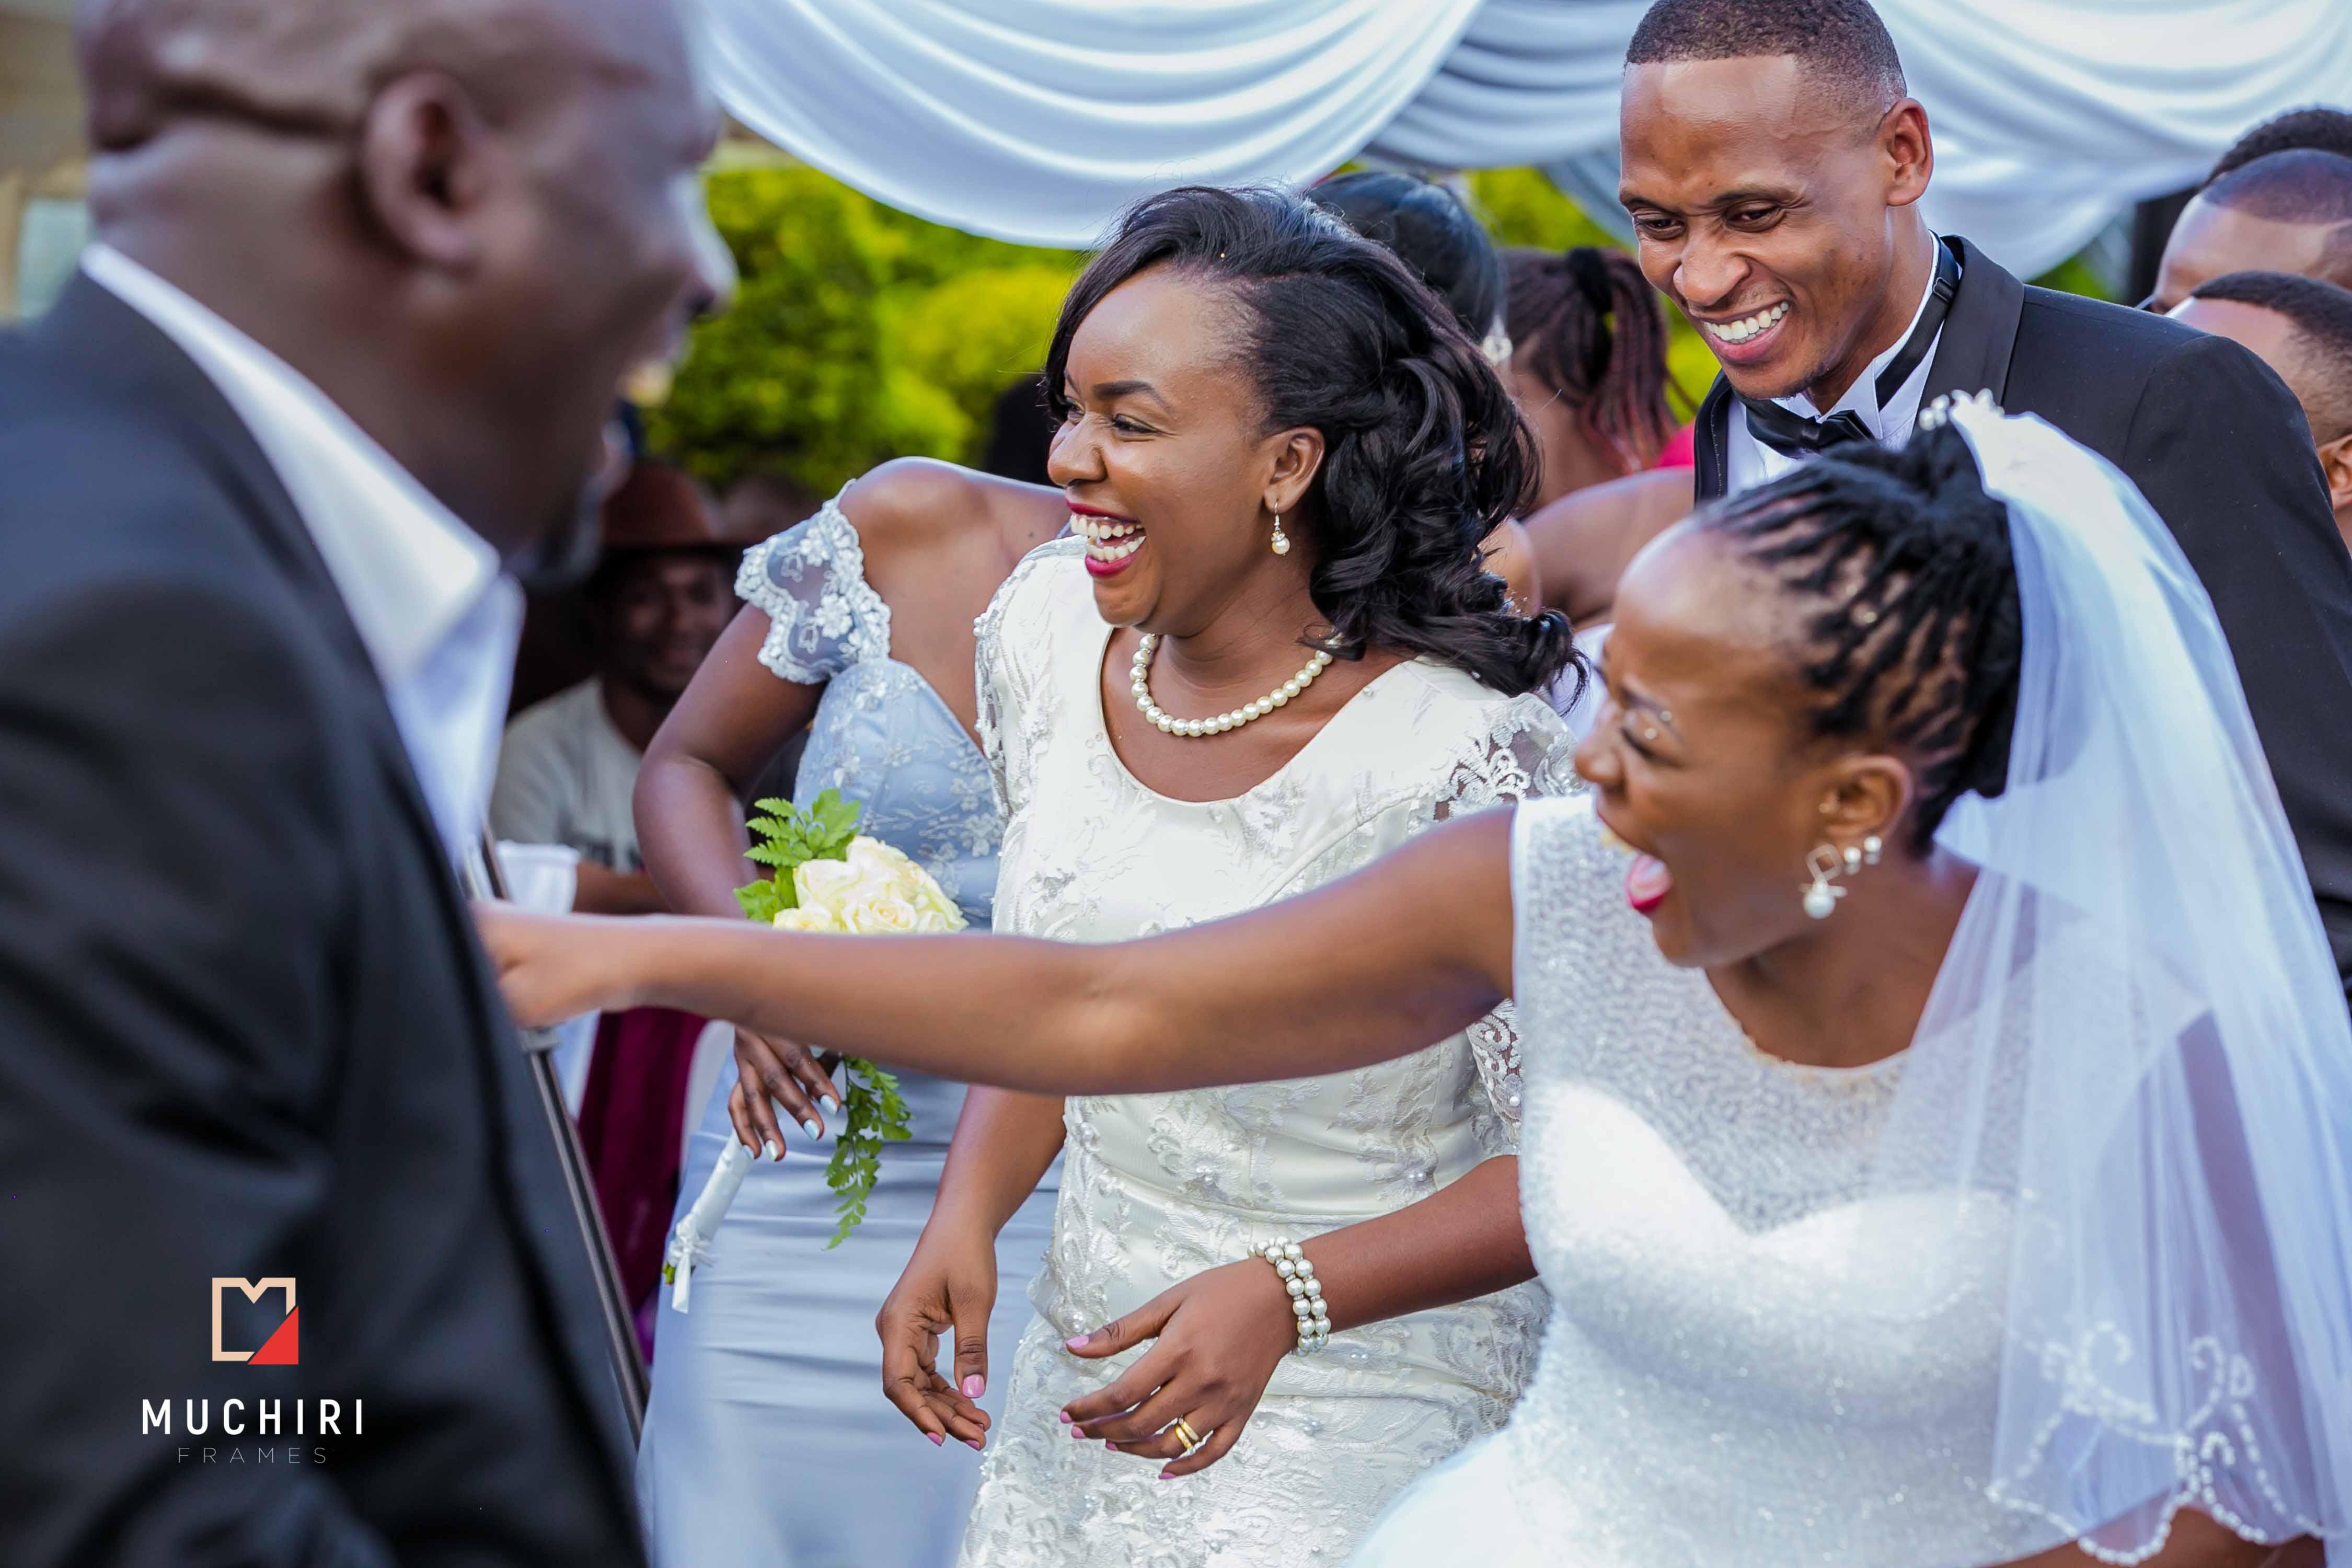 Top wedding photographers in Kenya